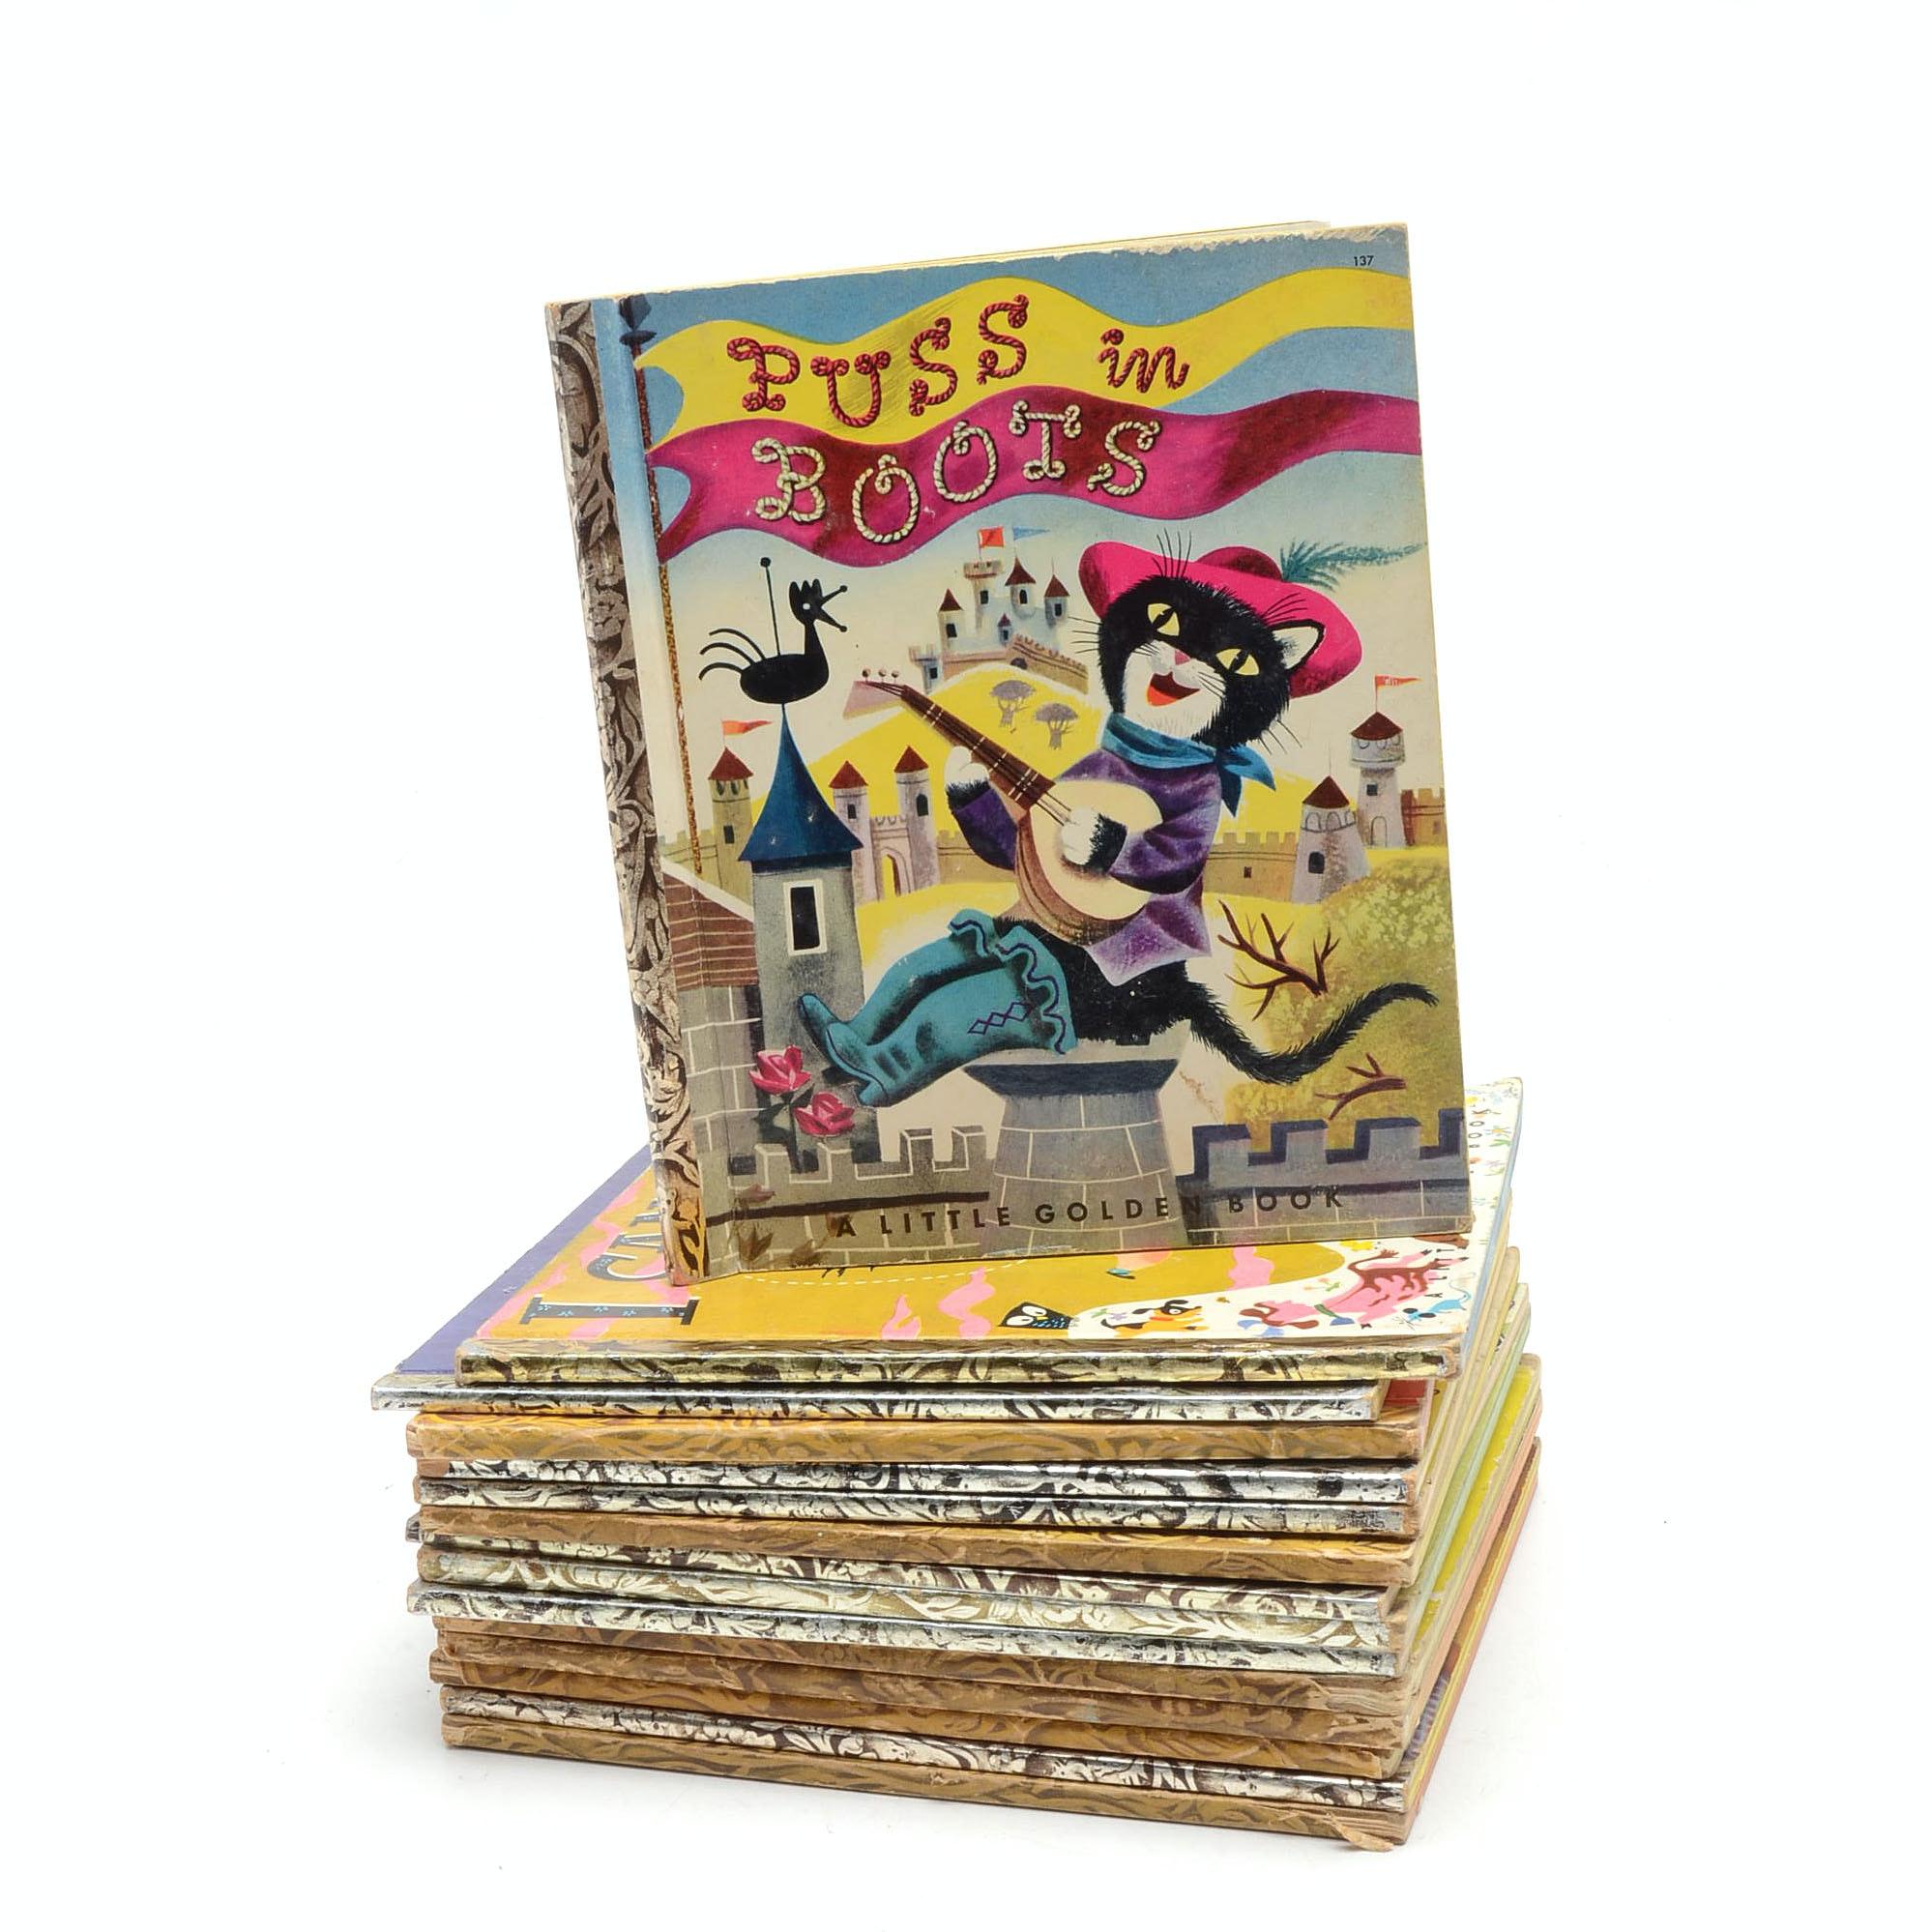 Collection of 1950's Little Golden Children's Books